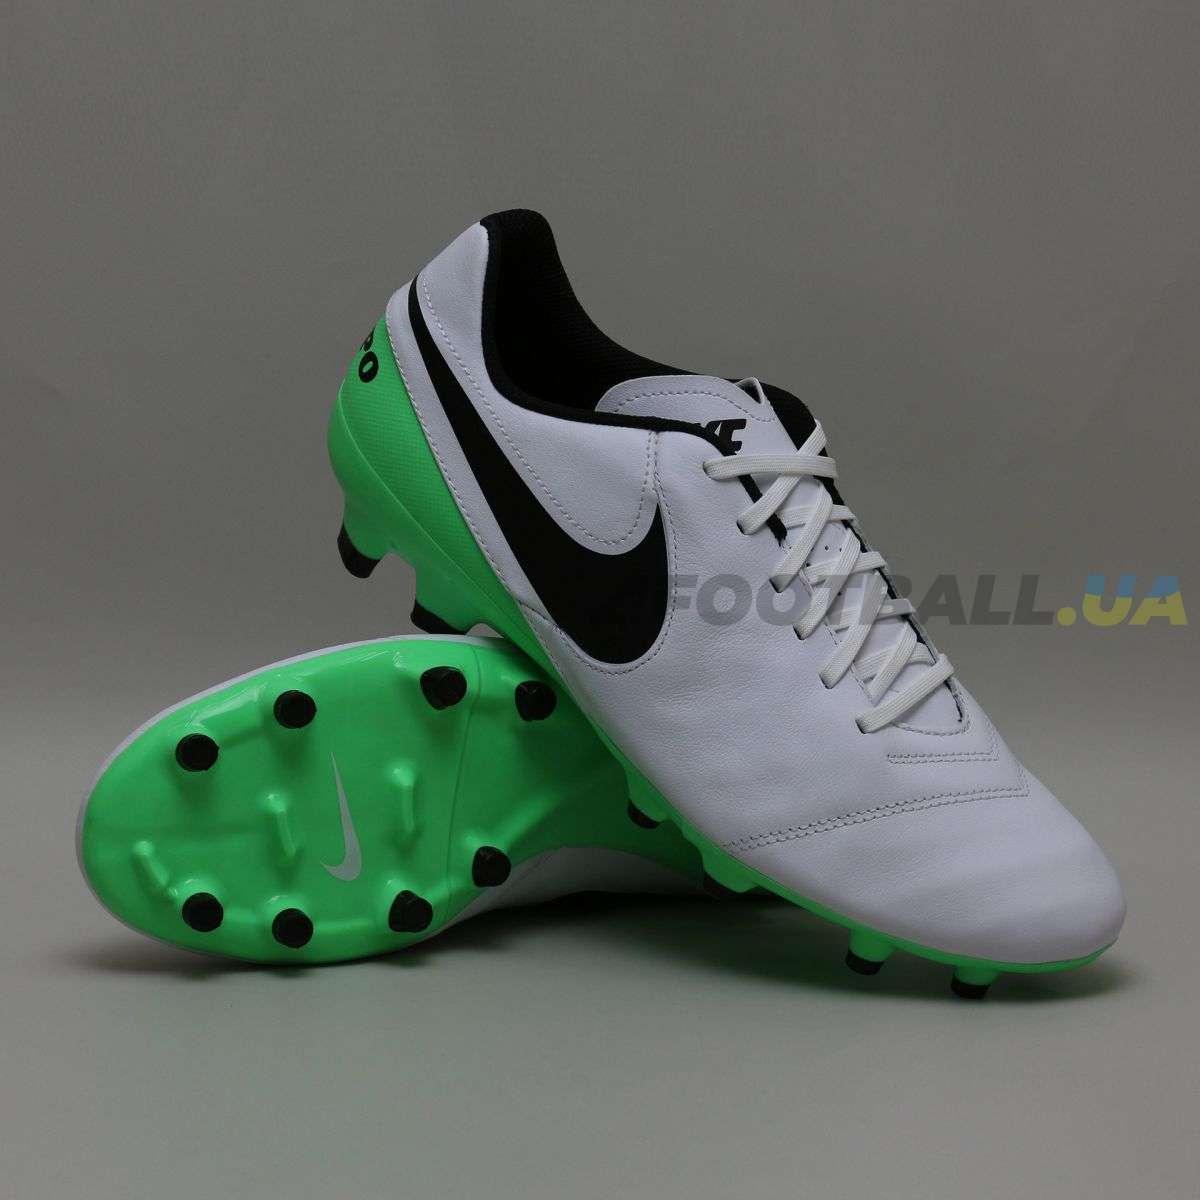 b6d202e2 Бутсы Nike Tiempo GENIO II Leather FG 819213-103 White купить на ...